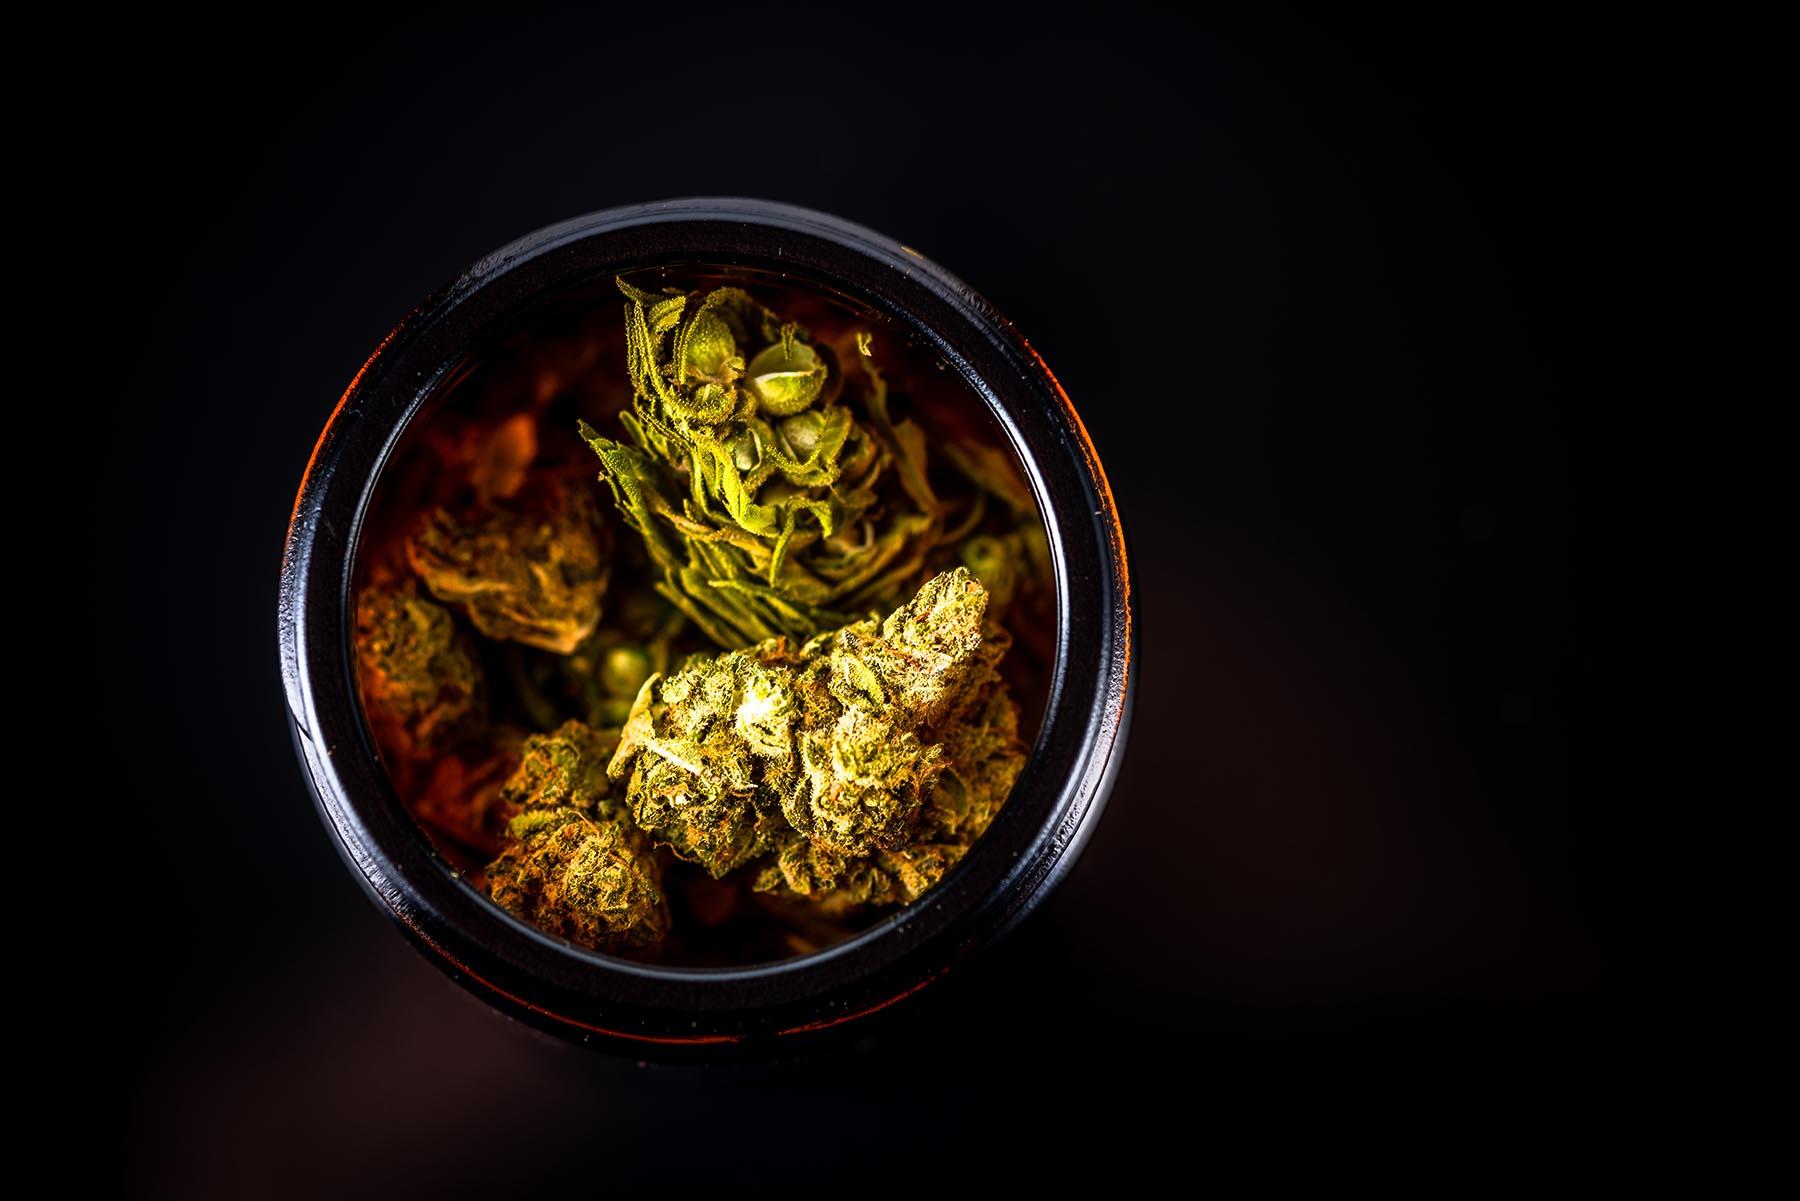 Cannabis in Glass Jar